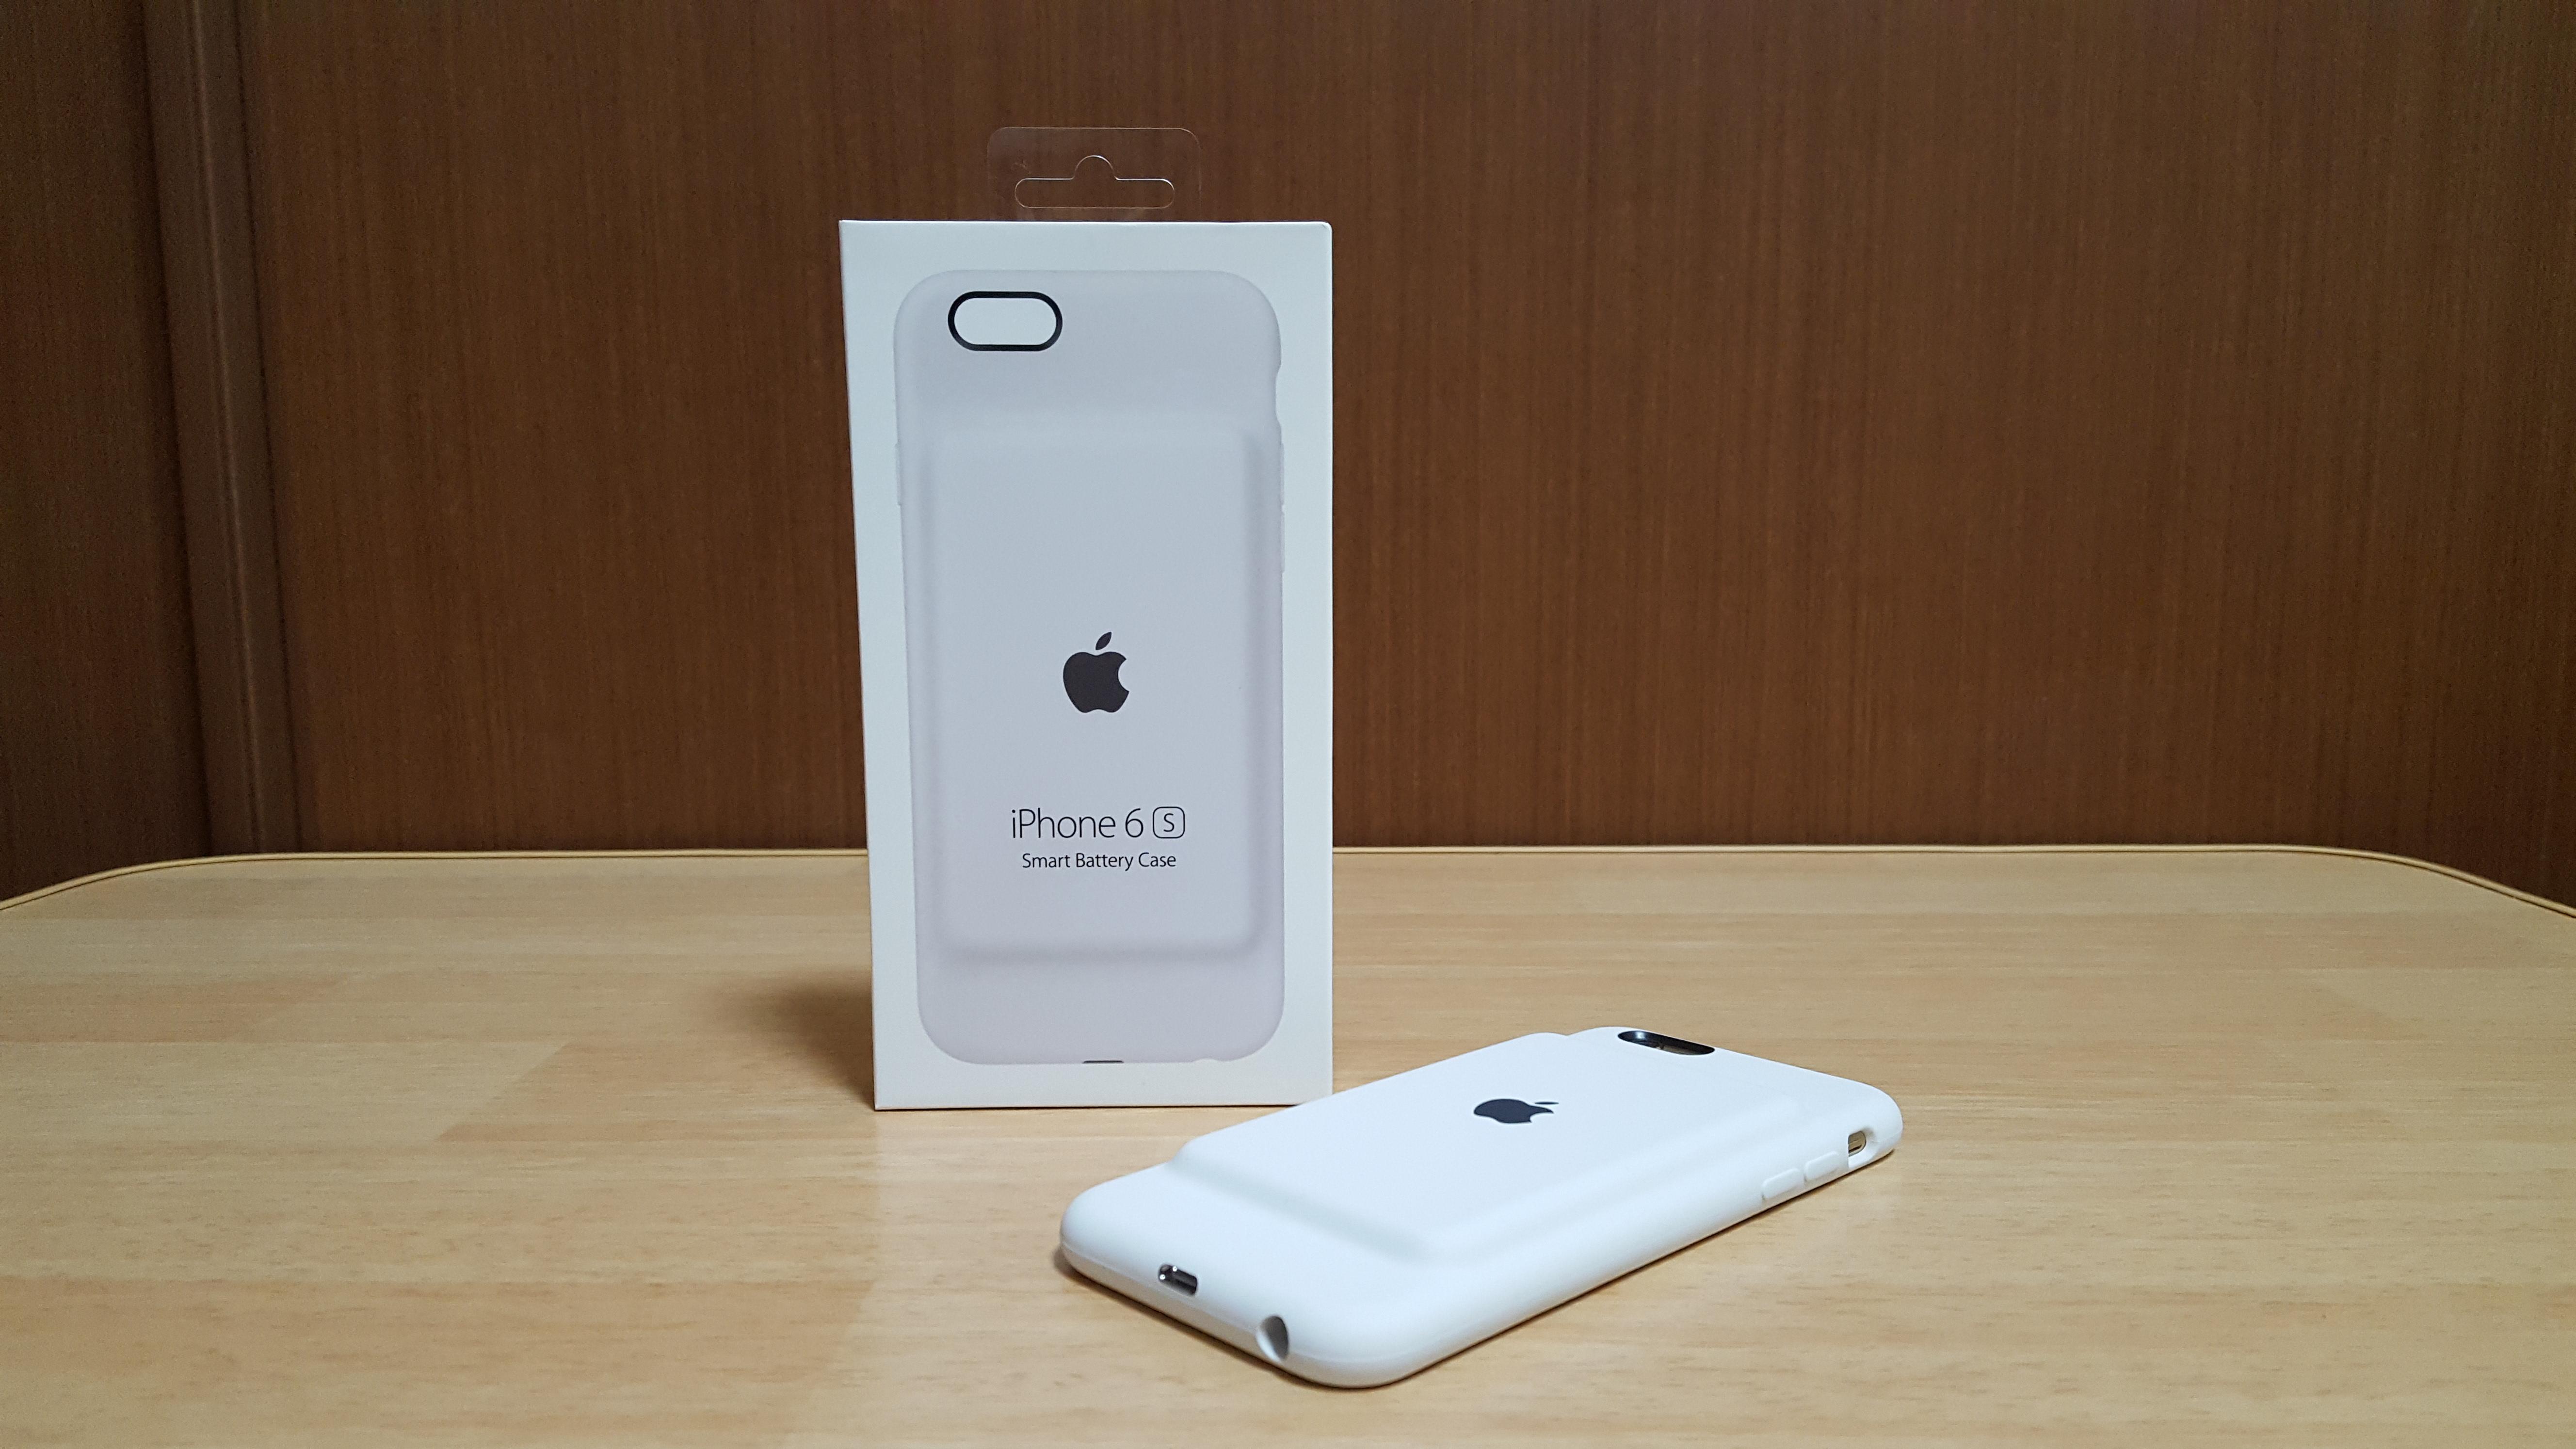 「iPhone 6s Smart Battery Case」購入。iPhone 6sのバッテリーライフを改善